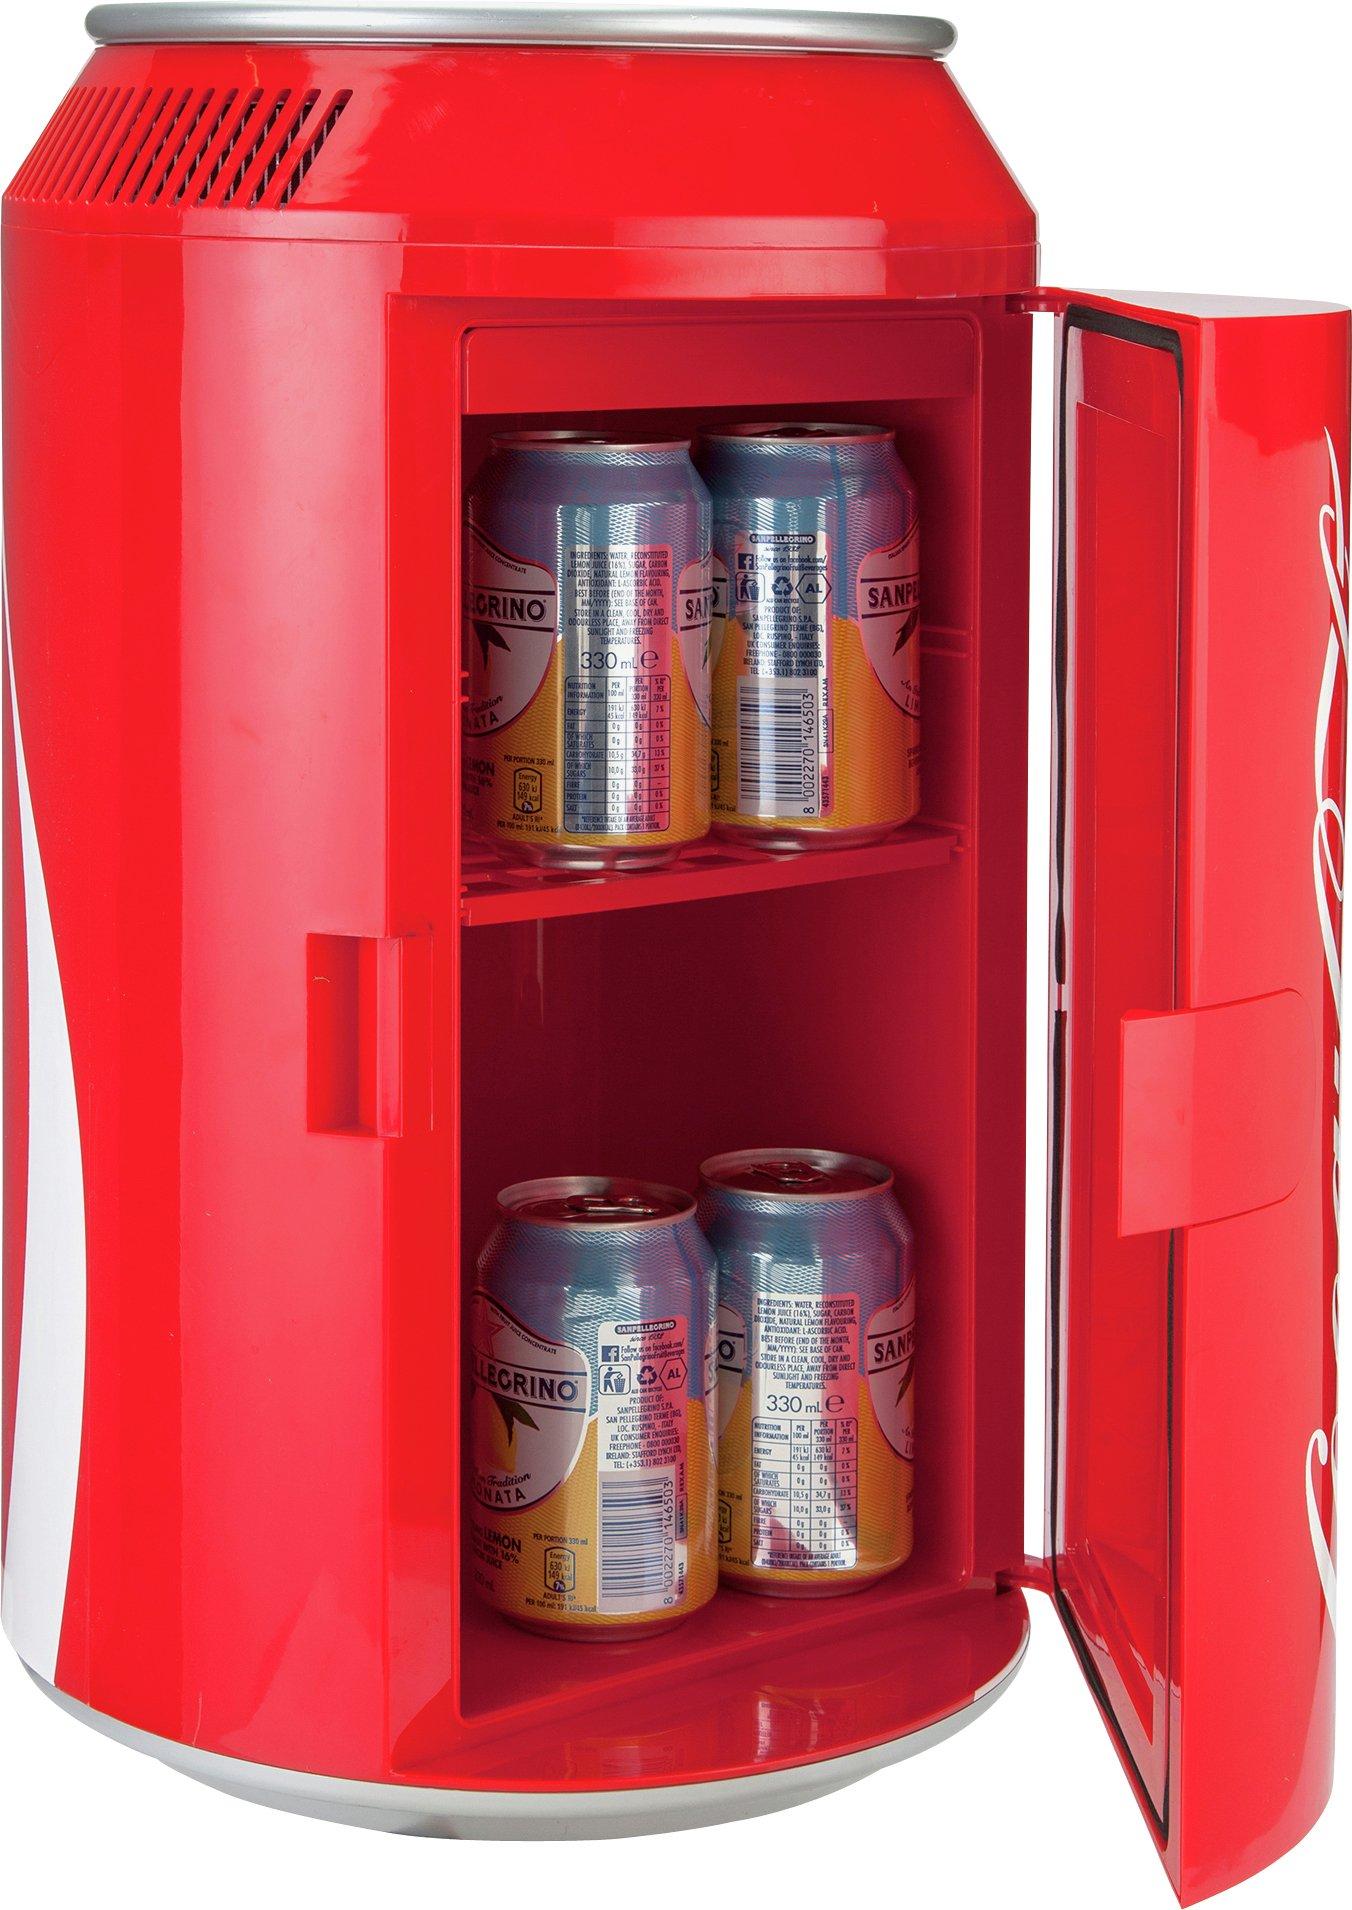 Coca-Cola 10 Litre Coke Can Fridge @ Argos Free C&C 51.99